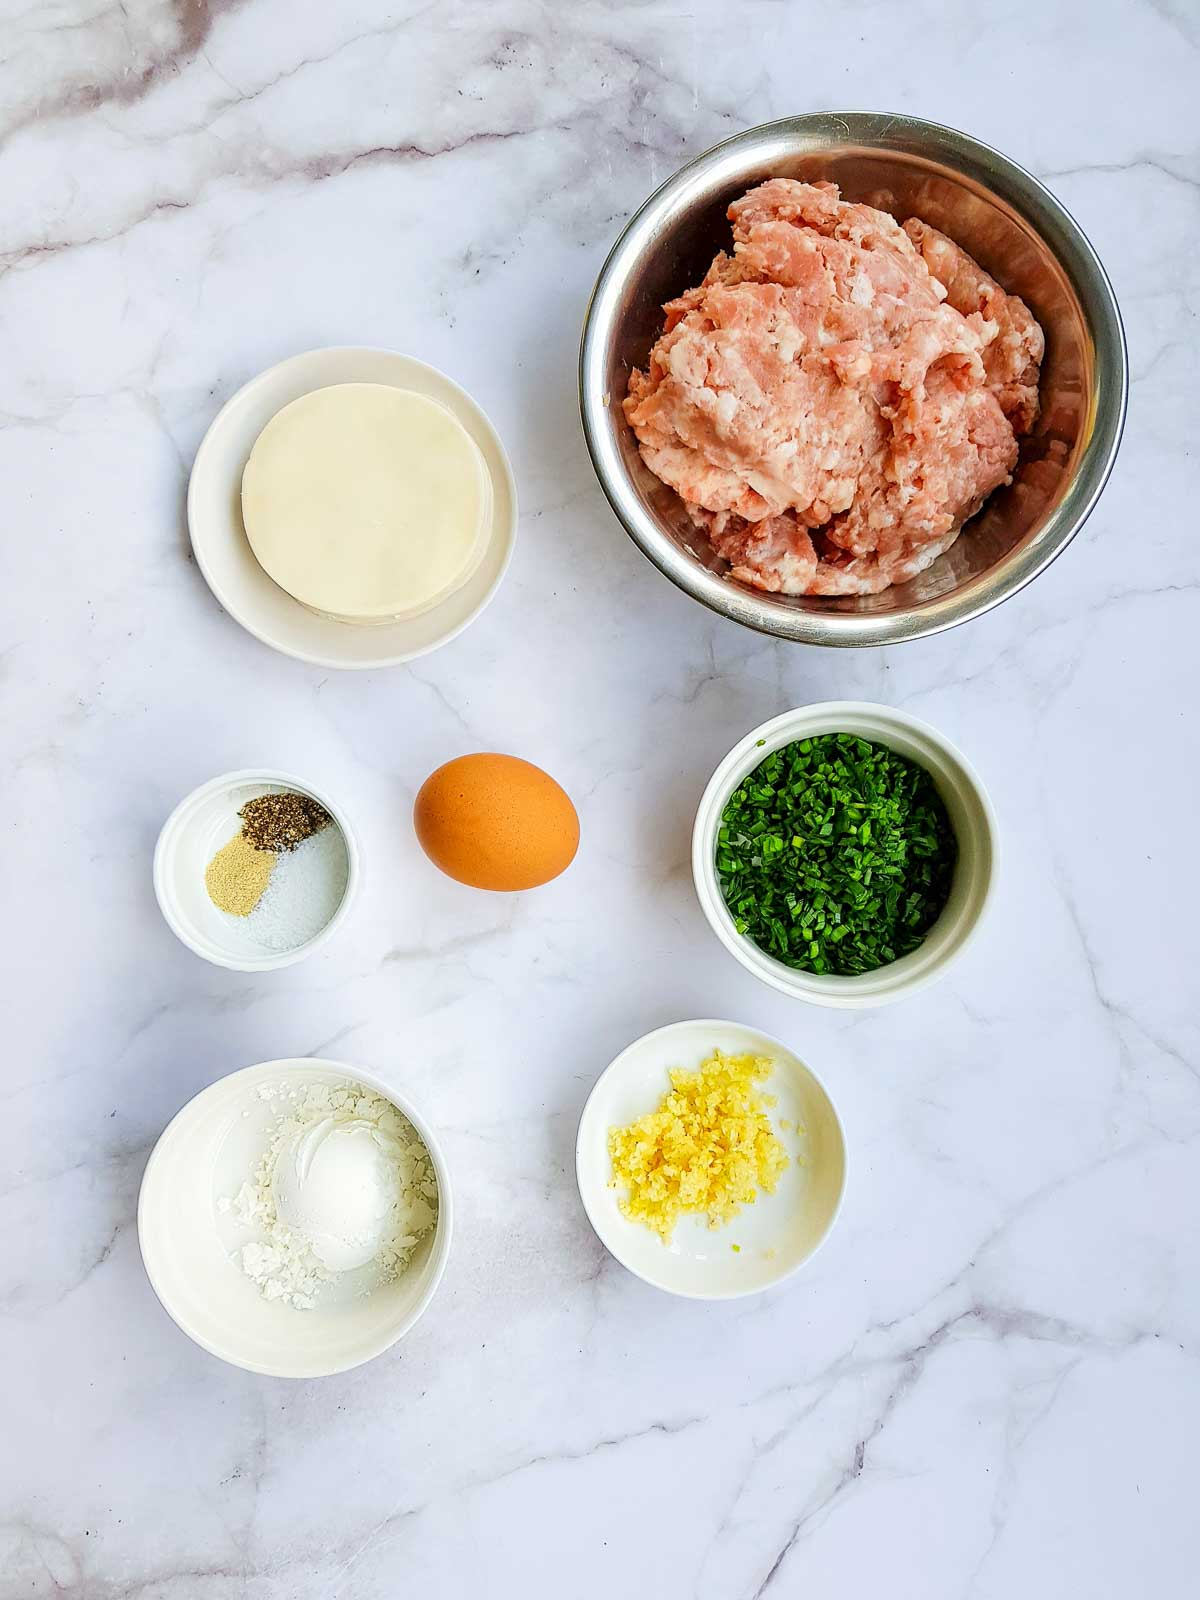 Ingredients for pork and chive dumplings.